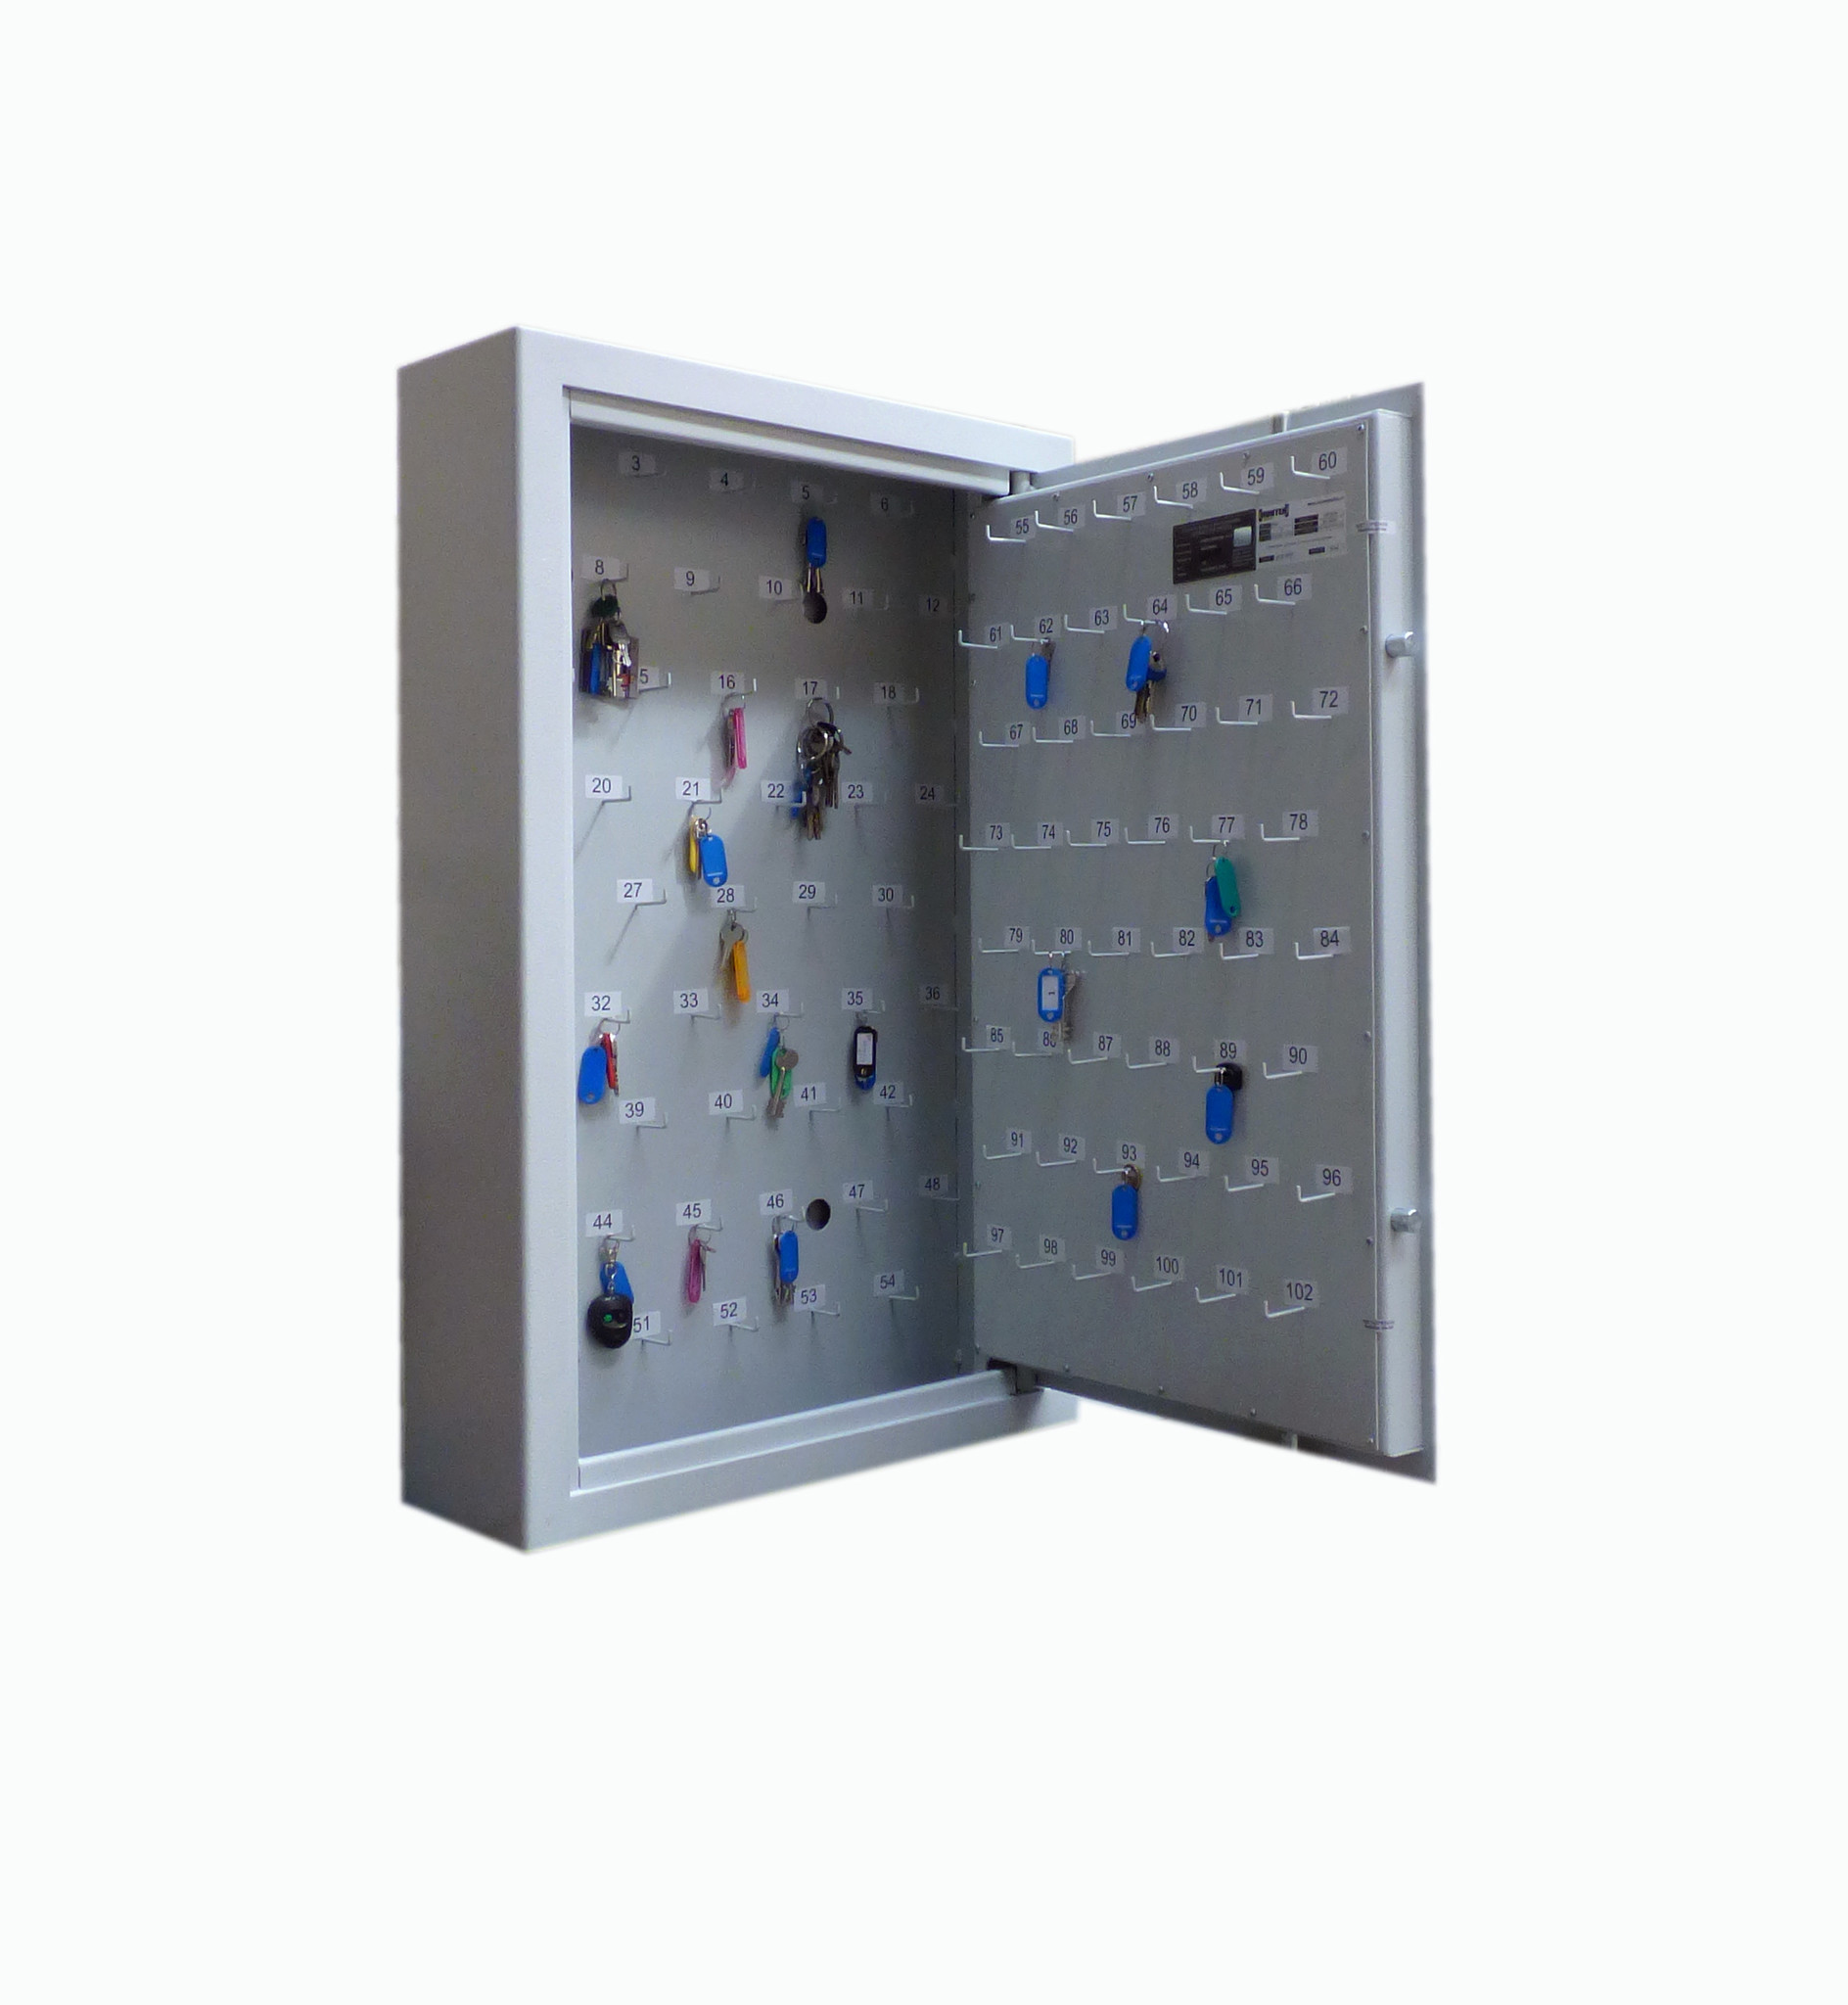 Sleutelkluis K950 voor 50 - 100 sleutels, rdw kluis, bovag kluis, sleutekluis autobedrijf